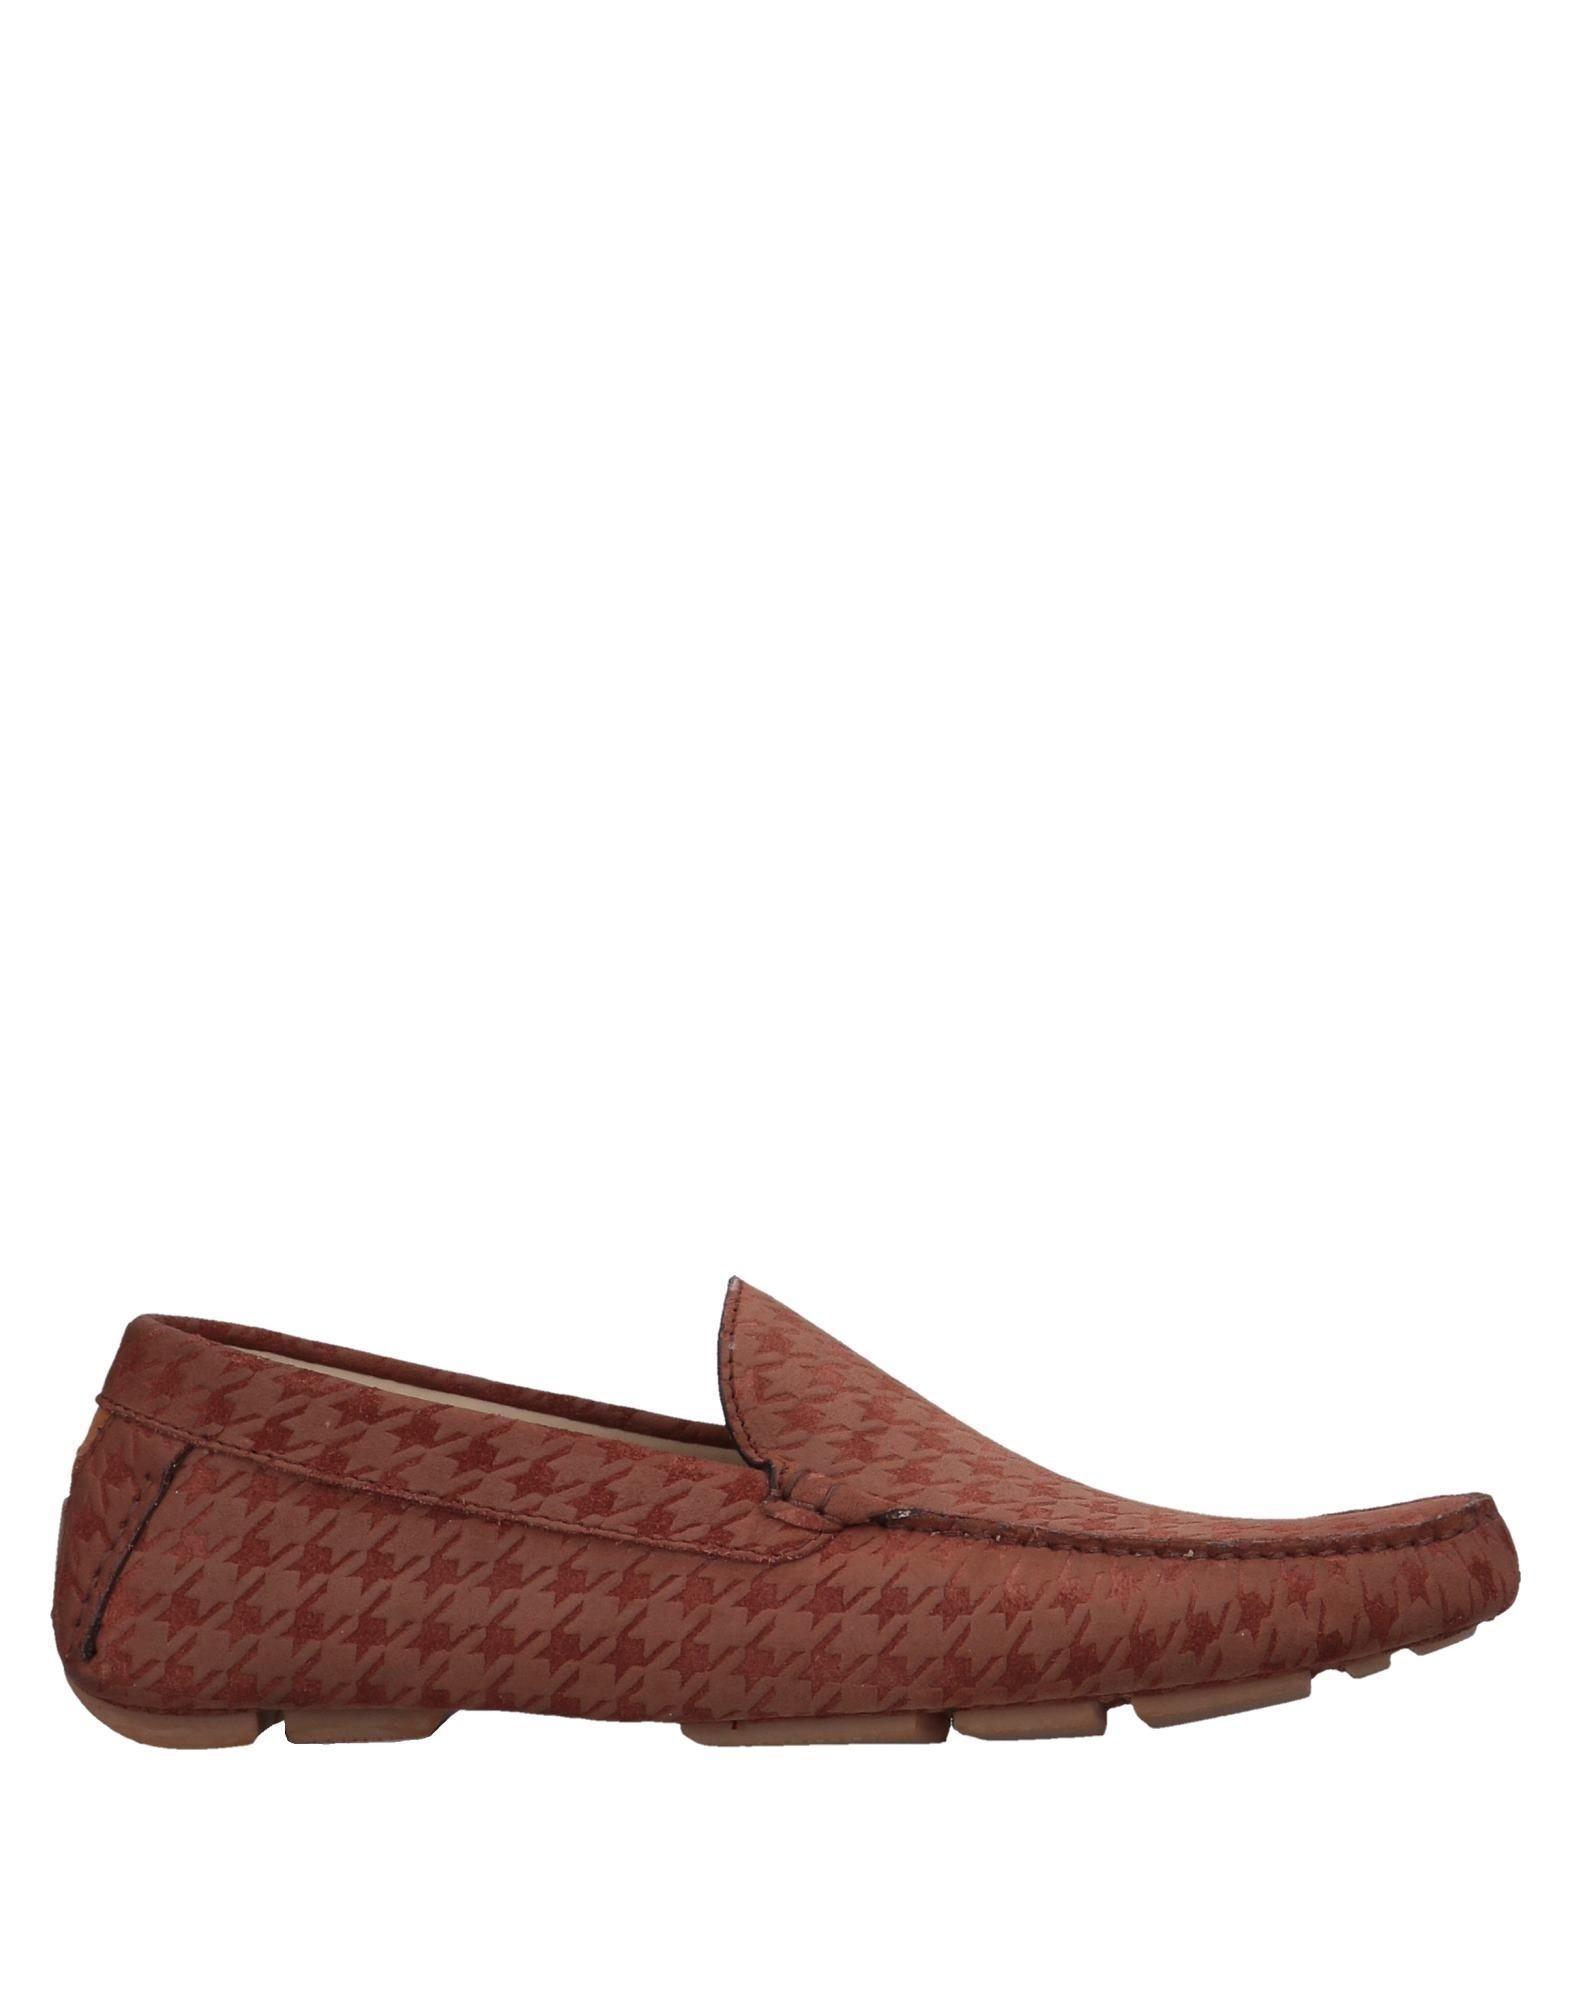 A.Testoni Mokassins Herren  11542525MR Gute Qualität beliebte Schuhe